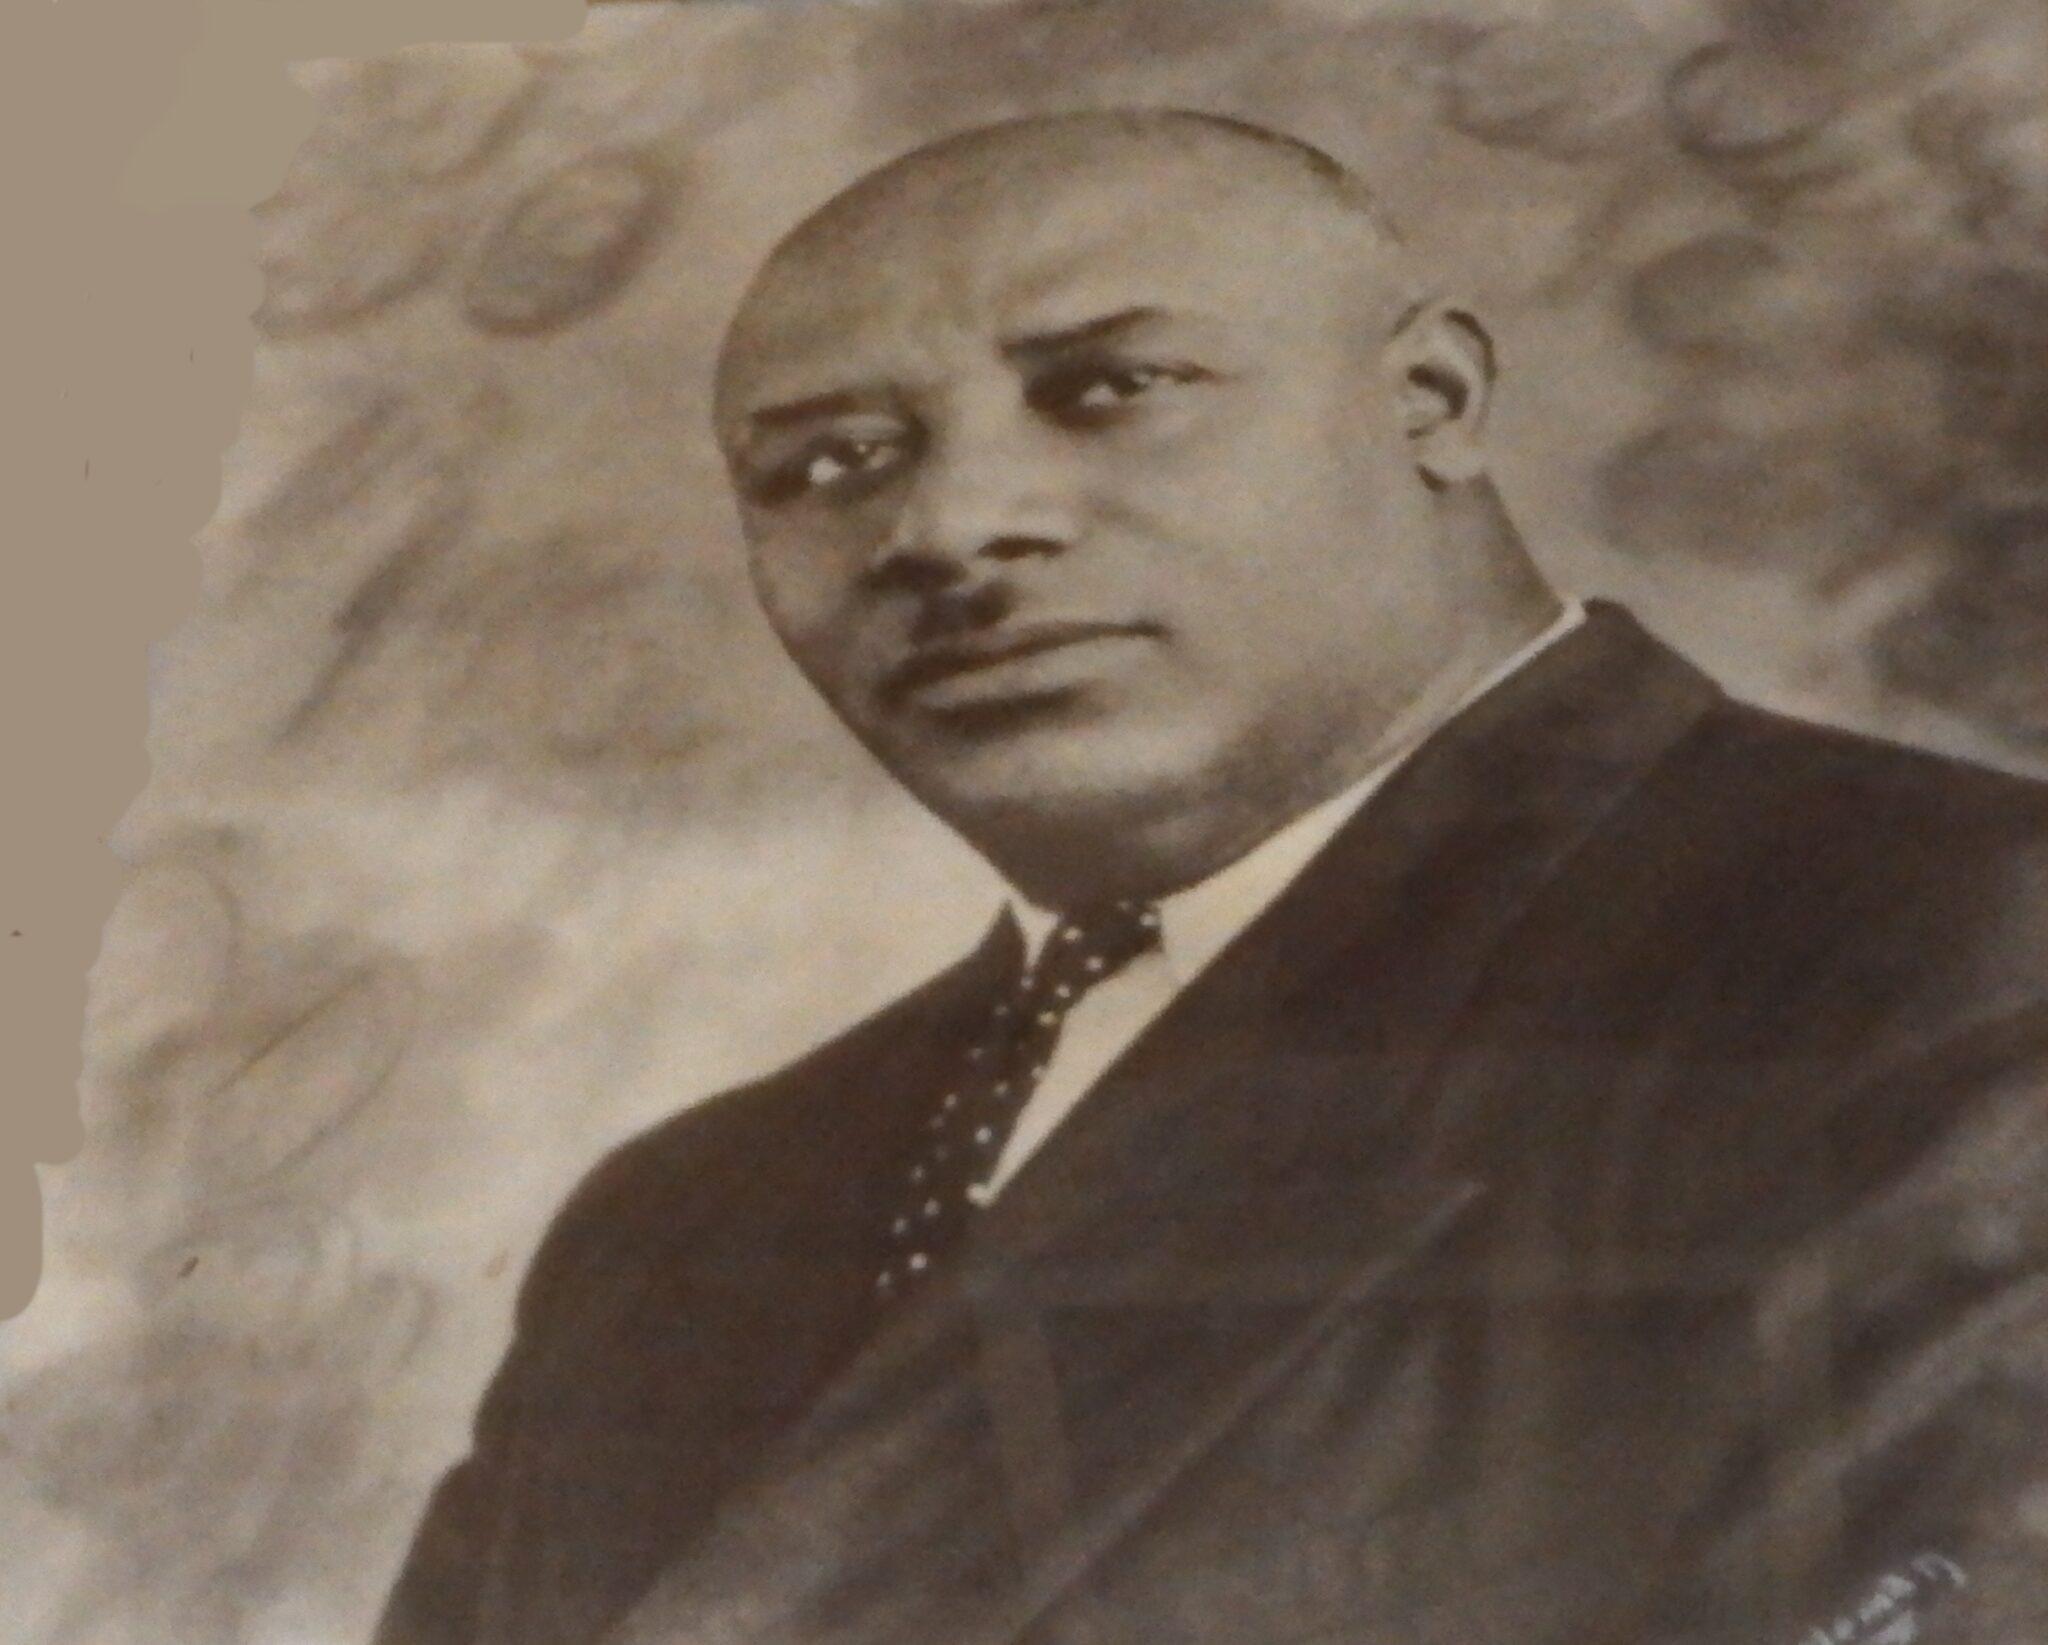 Rev. A. L. McCargo